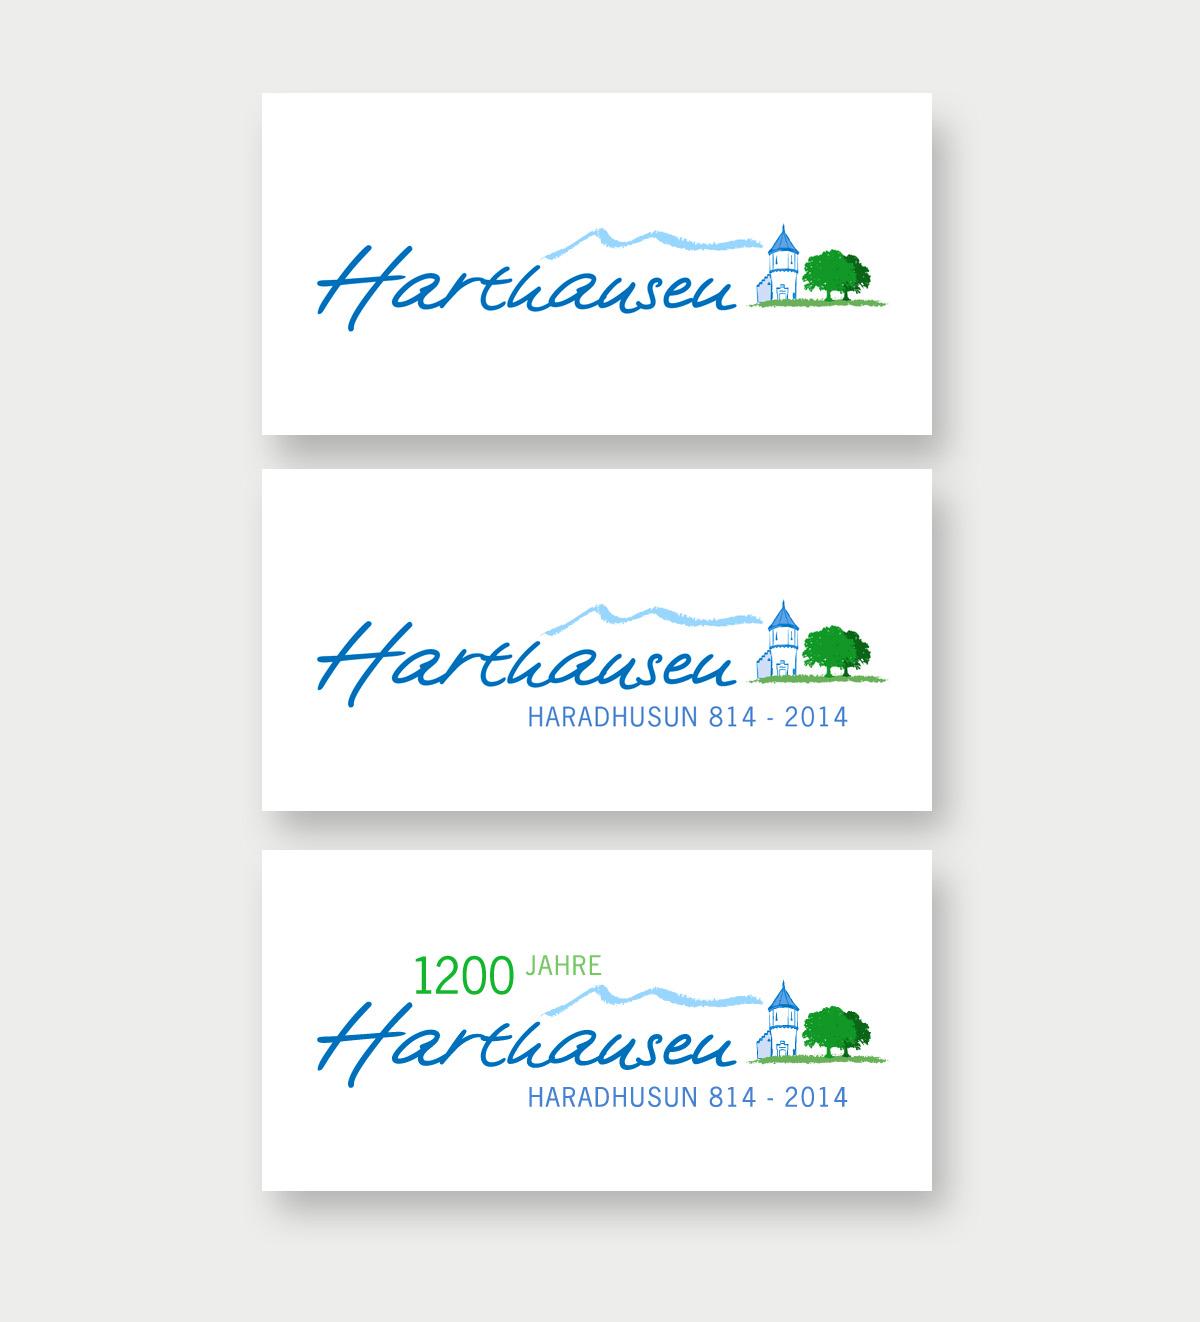 Harthausen-Logos-uebereinander